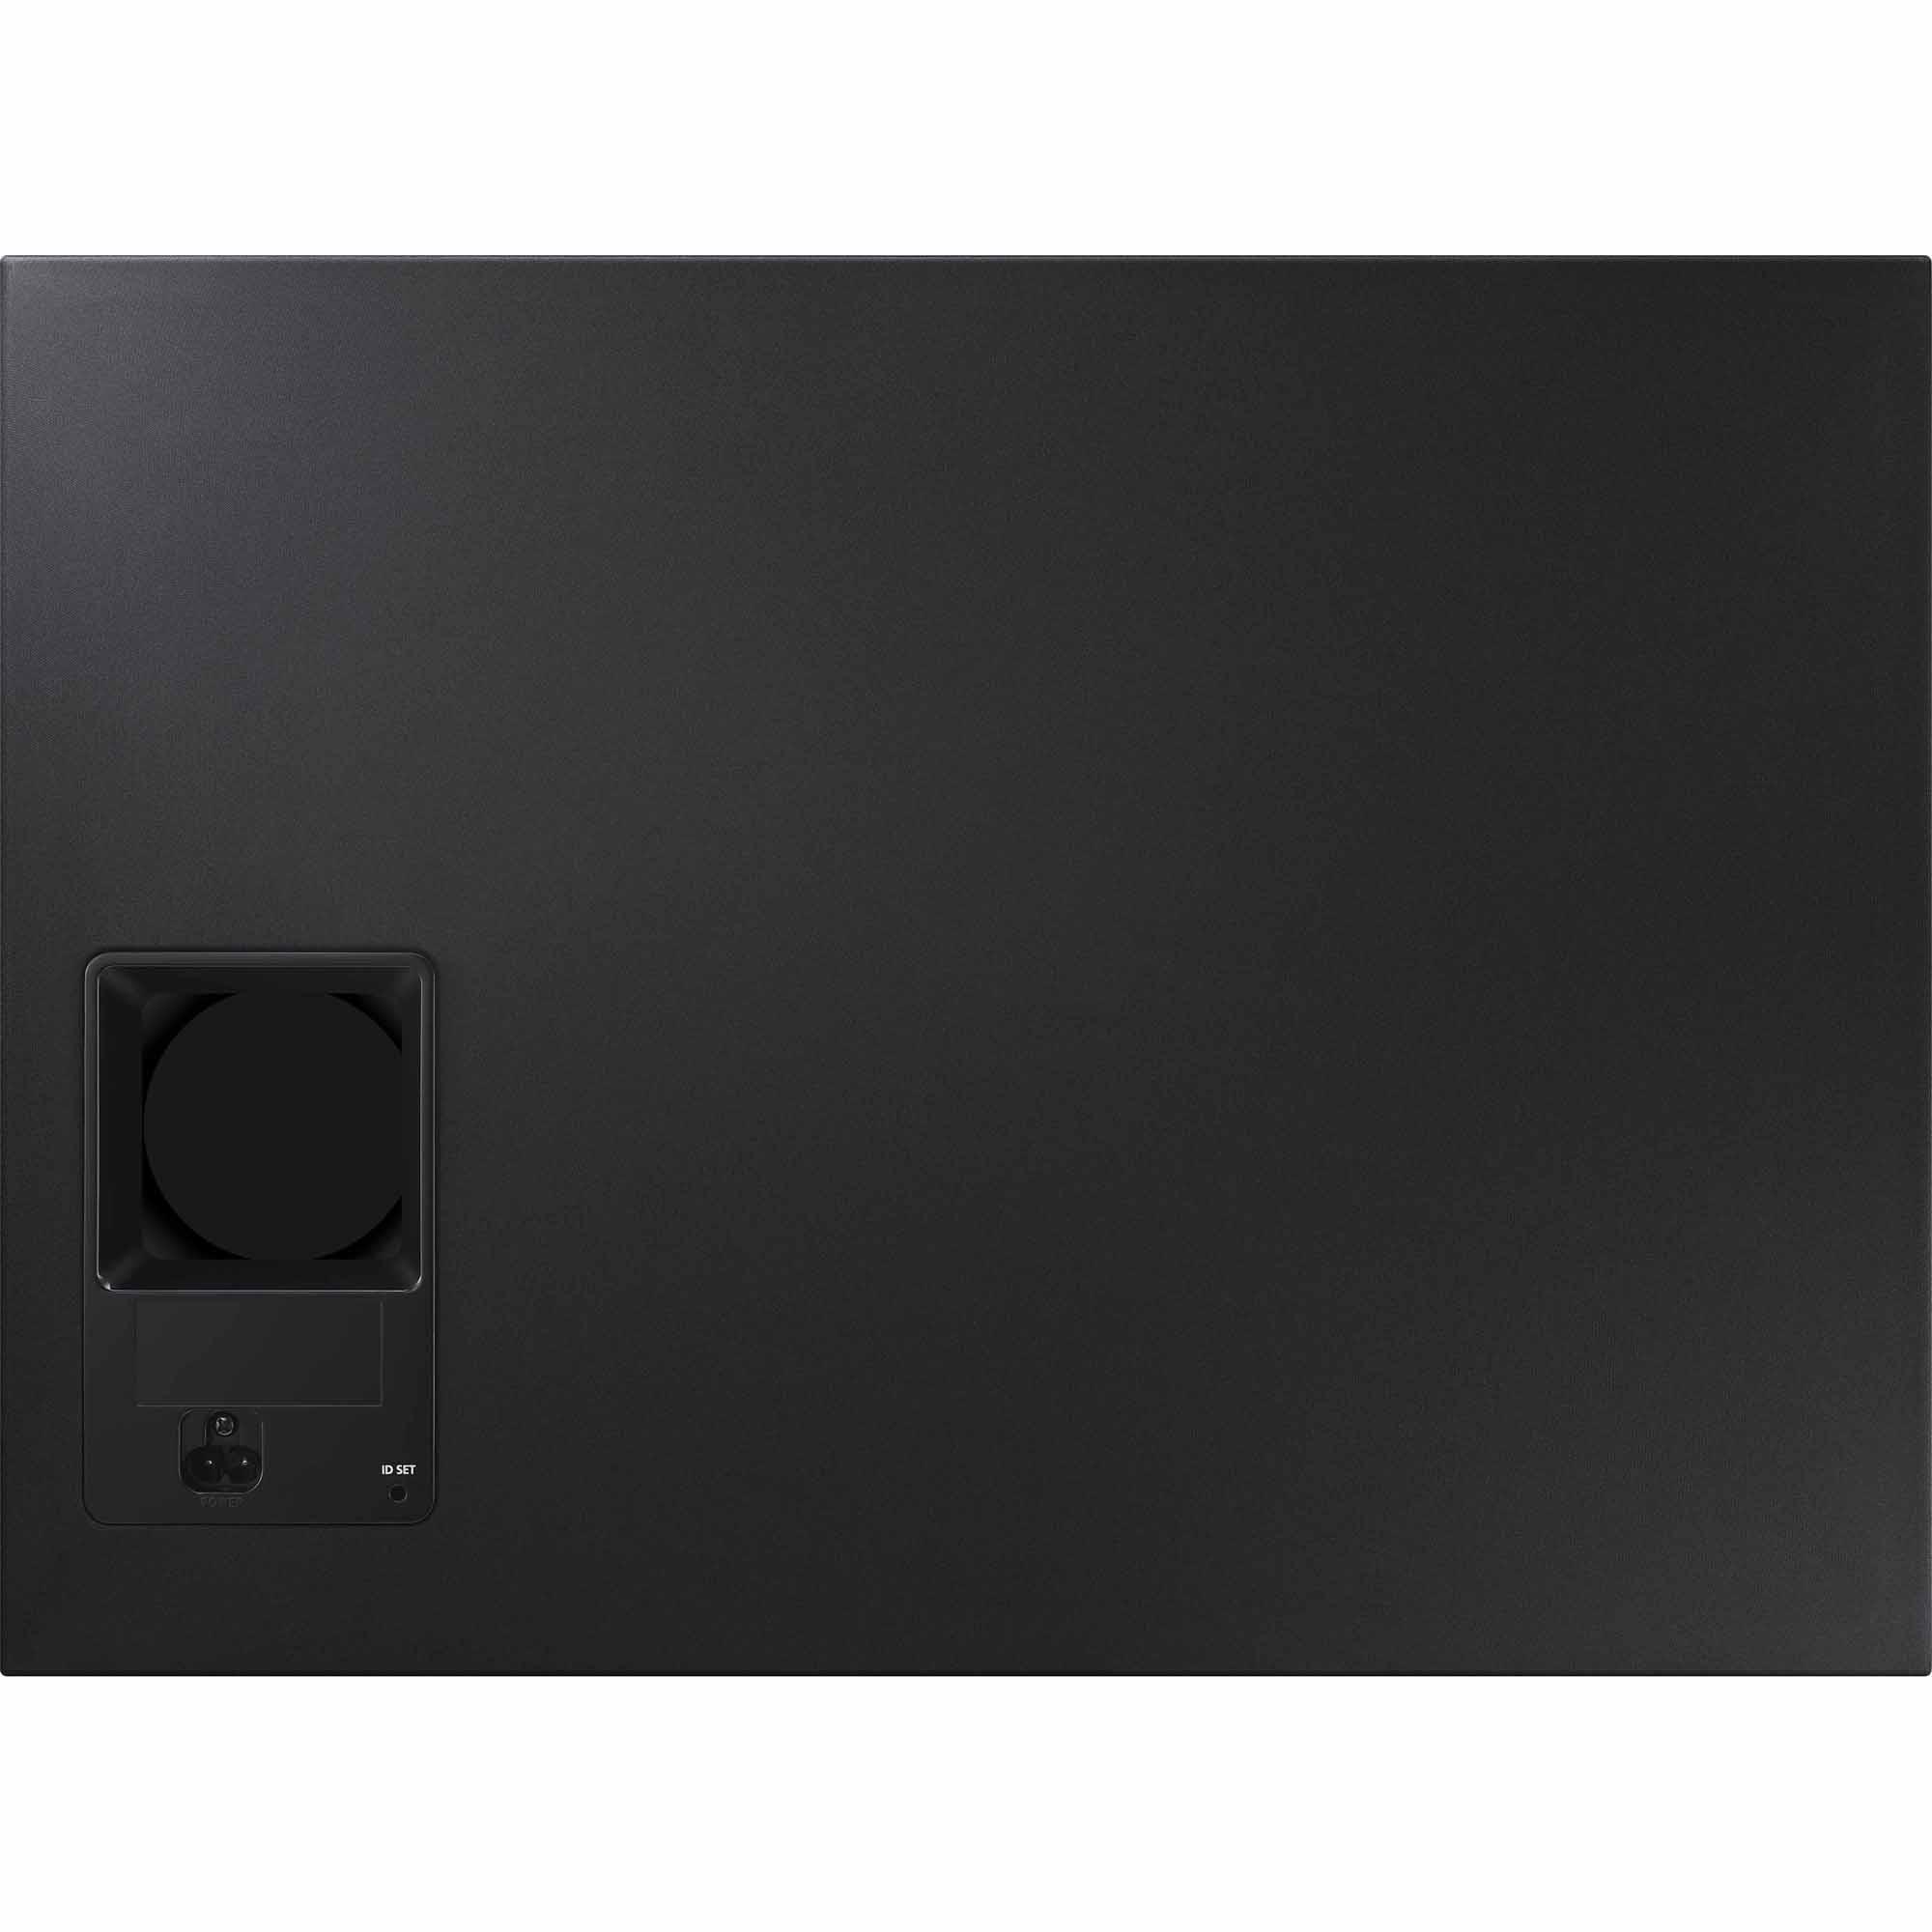 Samsung 2.1-Channel 320W Soundbar w/ Wireless Active Subwoofer - HW-J550